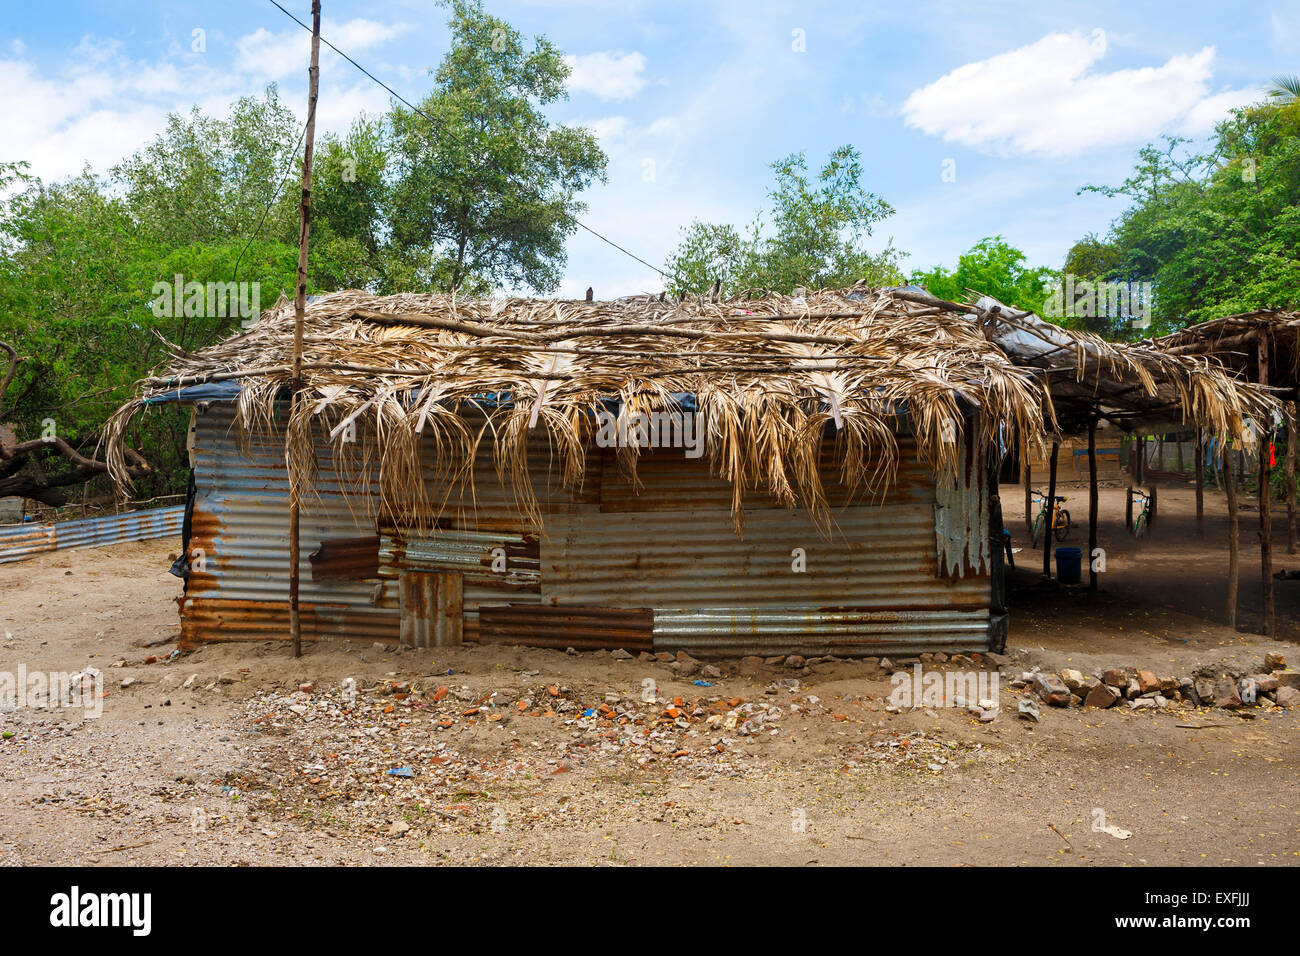 Hut in Honduras Central America - Stock Image